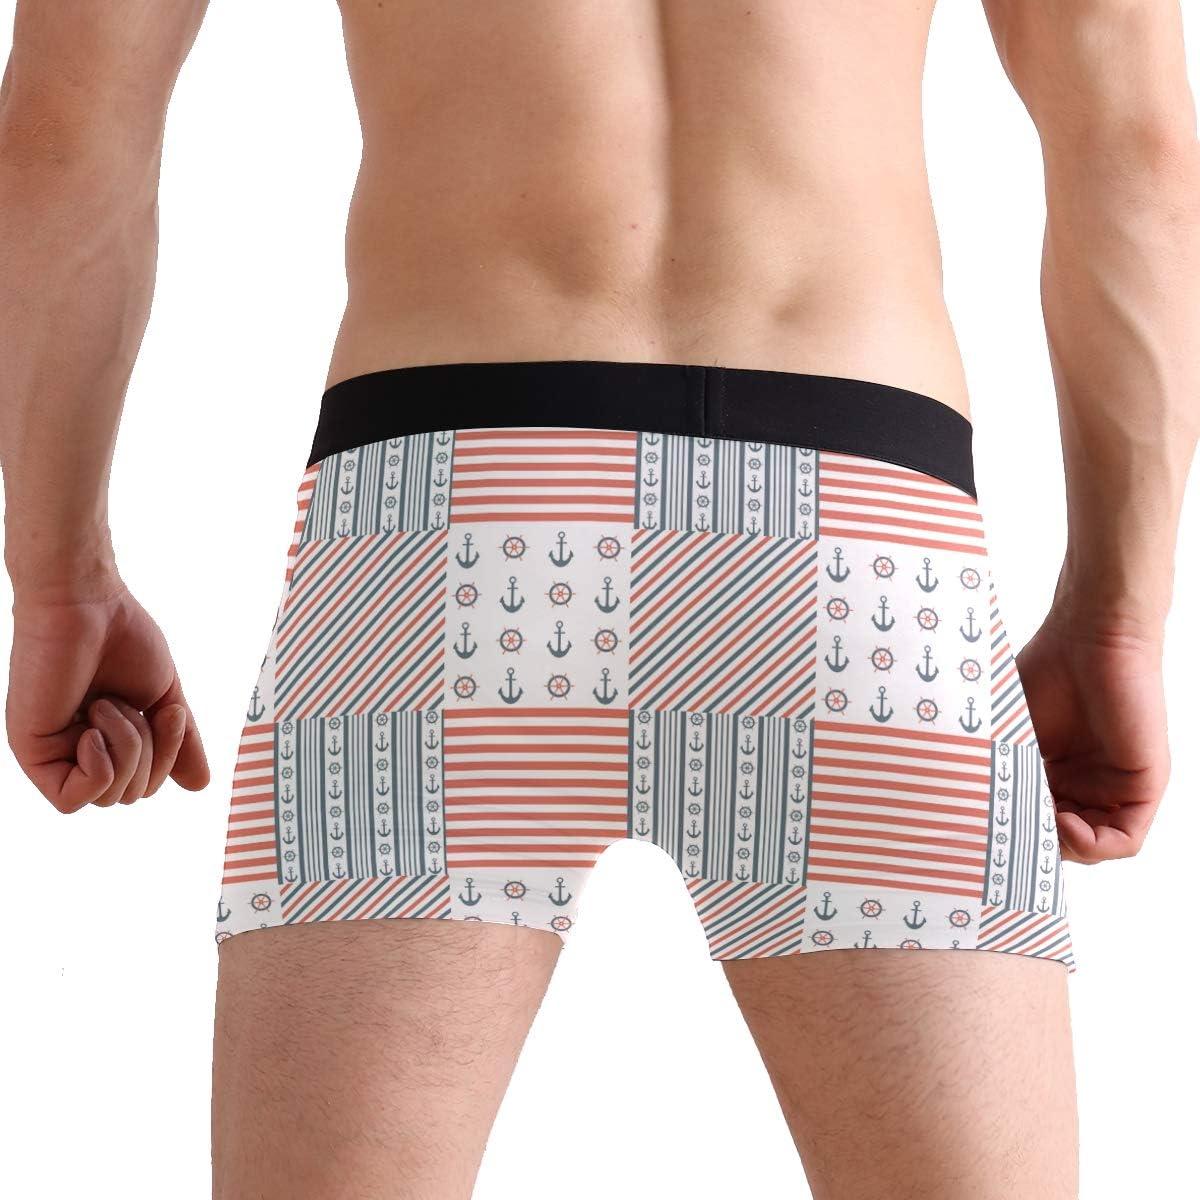 Anchor Print Stripe Mens Boxer Briefs Breathable Underwear Super Soft Cotton Full-Cut Briefs-2Pack